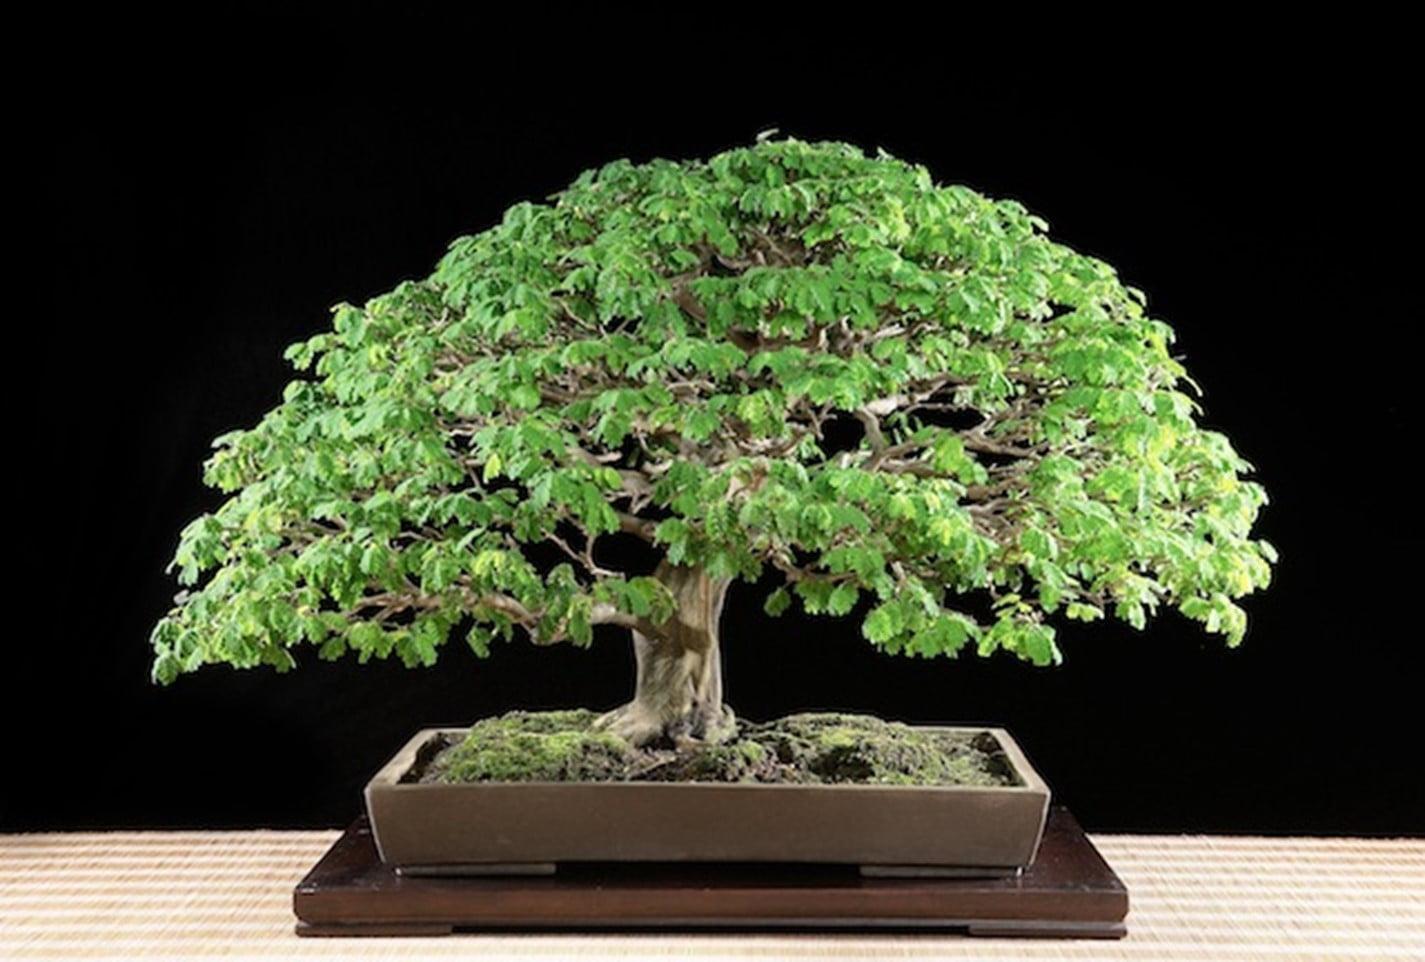 Brazilian raintree (Pithecellobium Tortum)